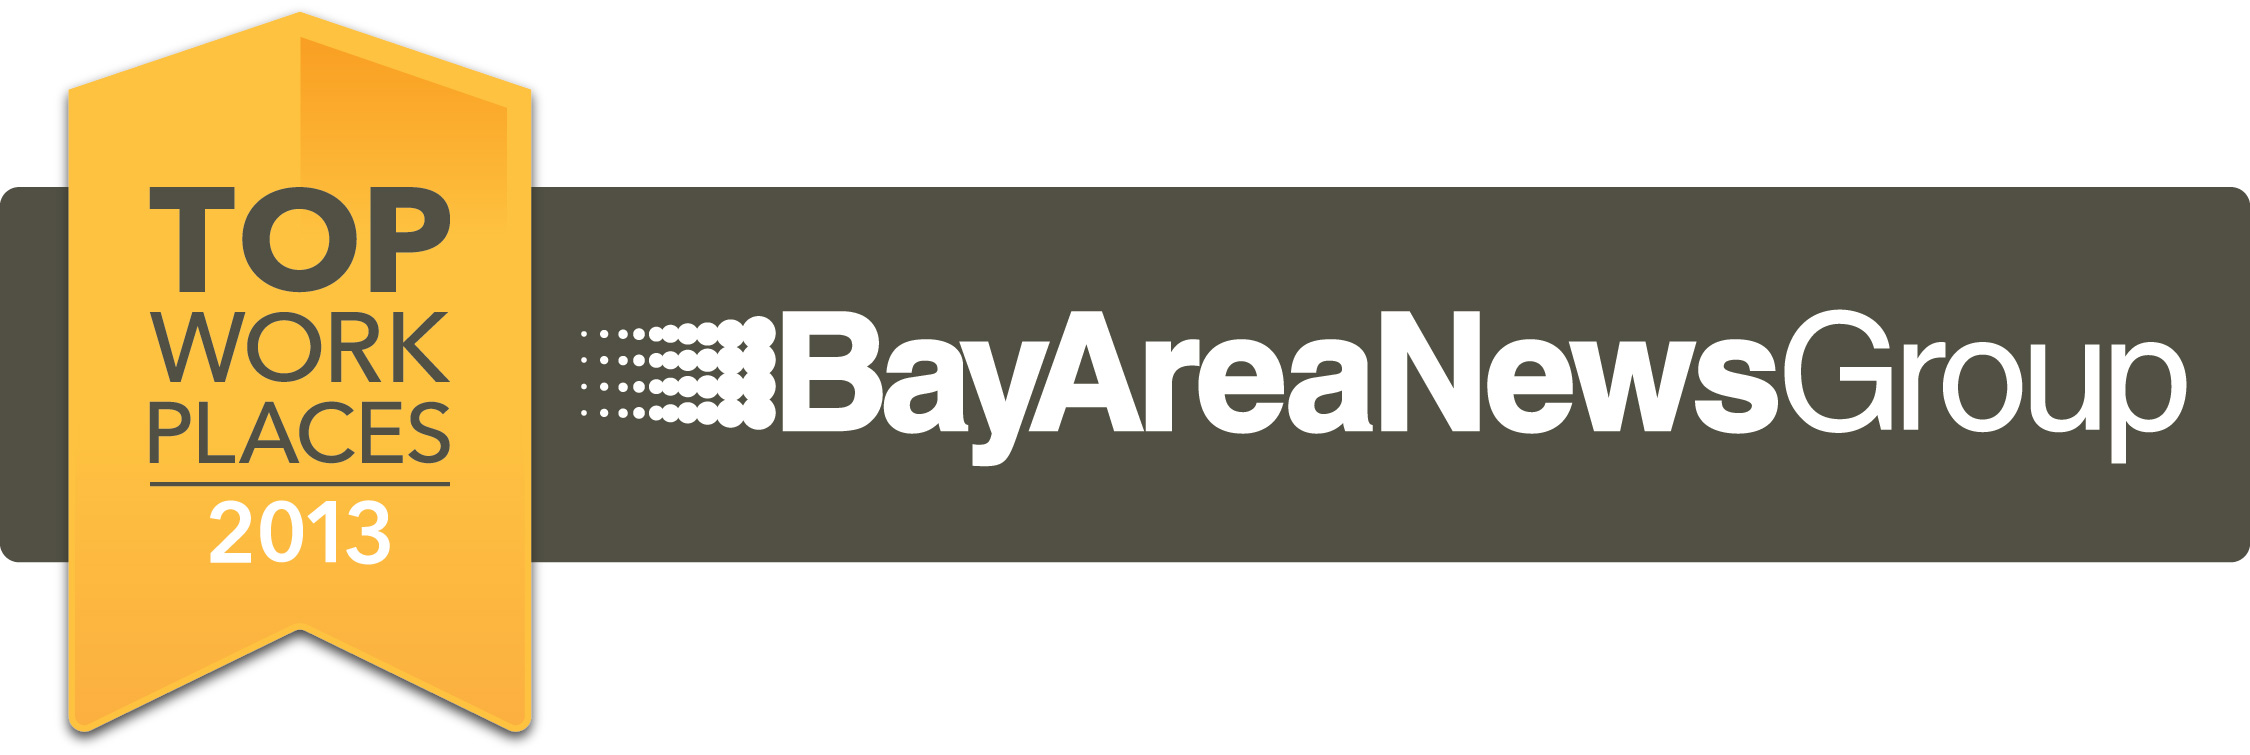 Area bangers bay